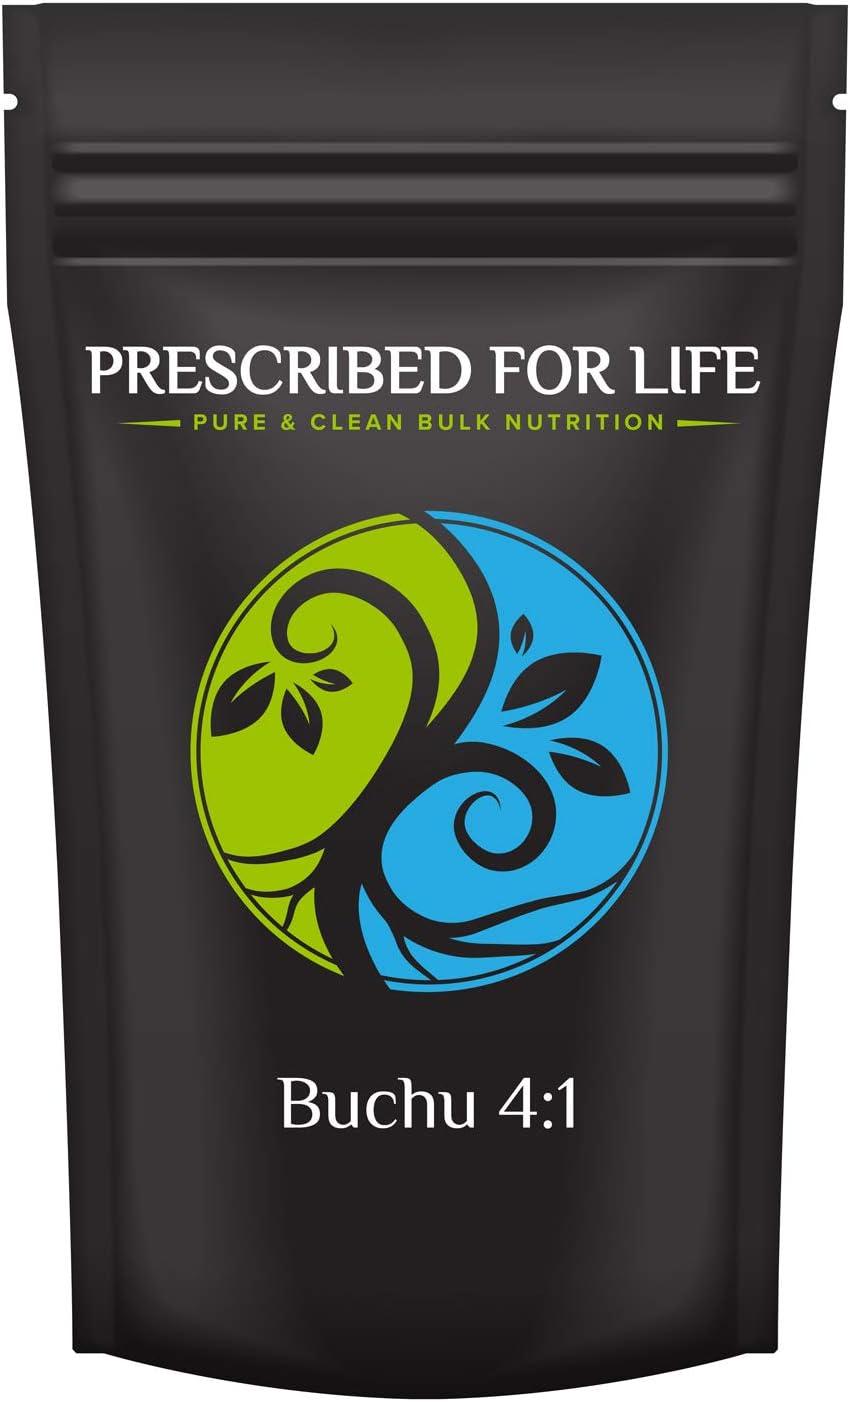 Prescribed for Life Buchu - 4:1 Leaf 5 popular Extract wholesale Powder Natural Bar